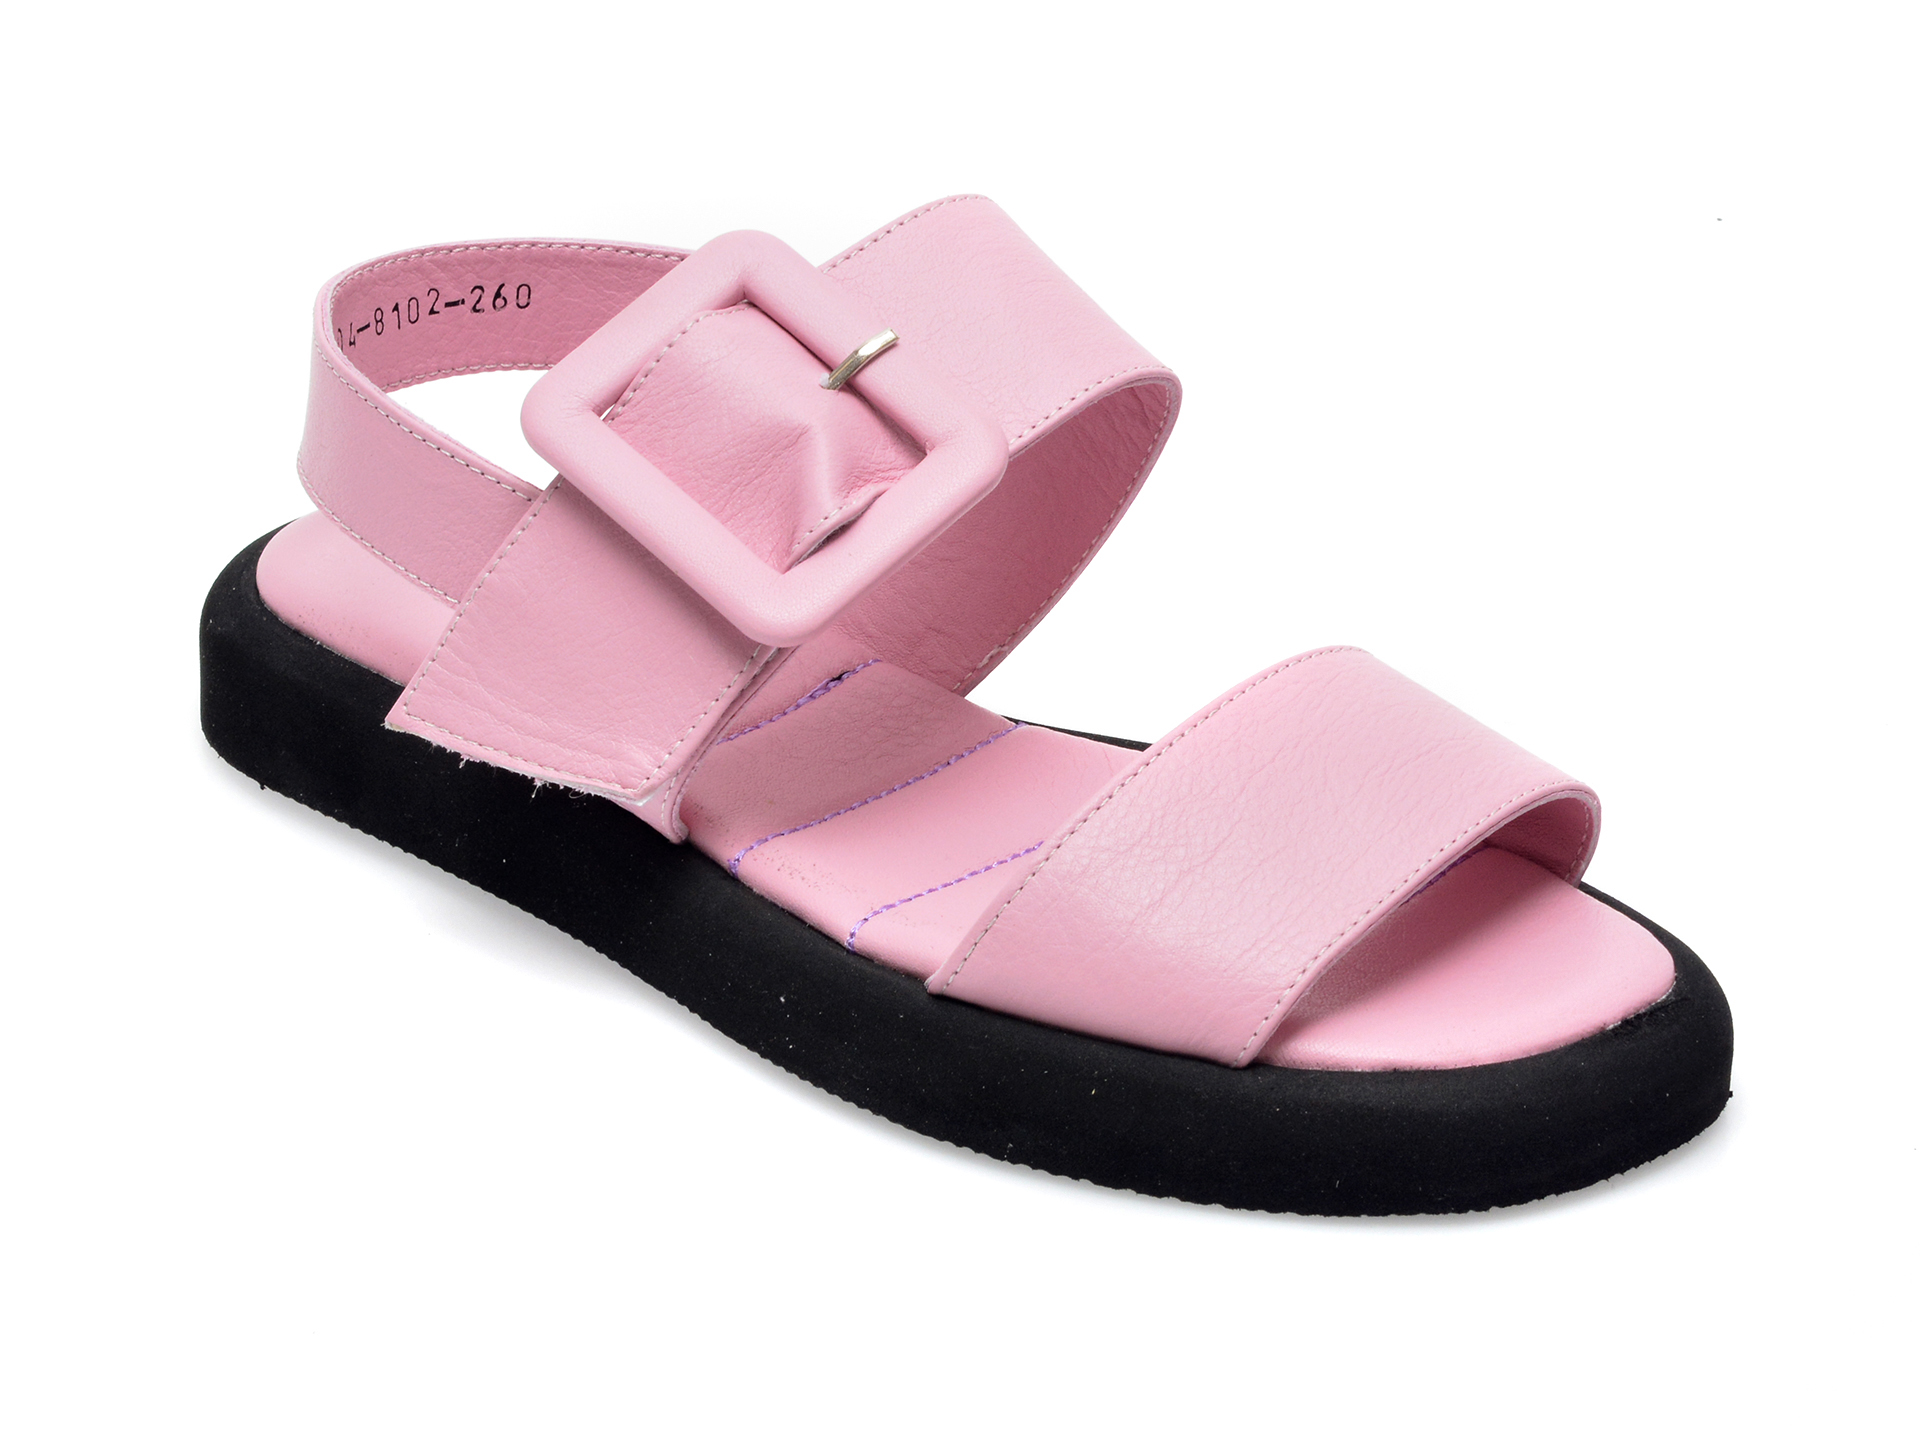 Sandale FLAVIA PASSINI roz, 2048102, din piele naturala imagine otter.ro 2021